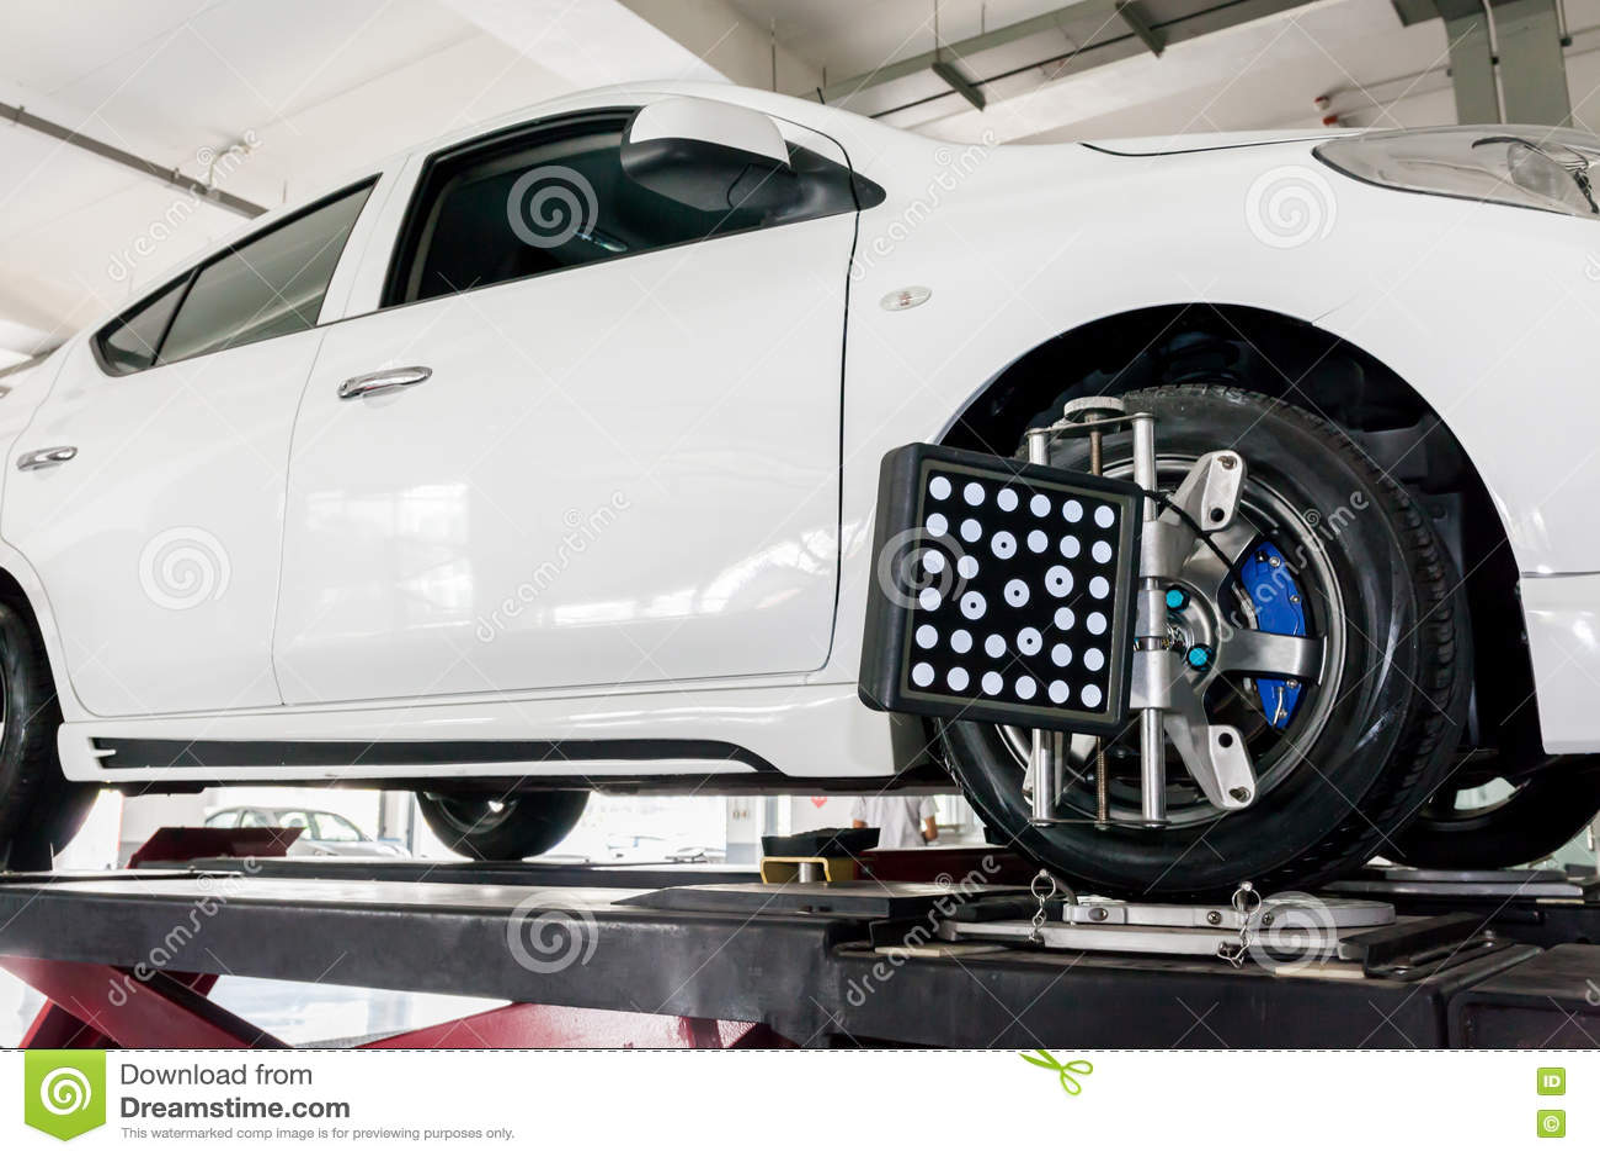 suspension adjustment and automobile wheel alignment work stock